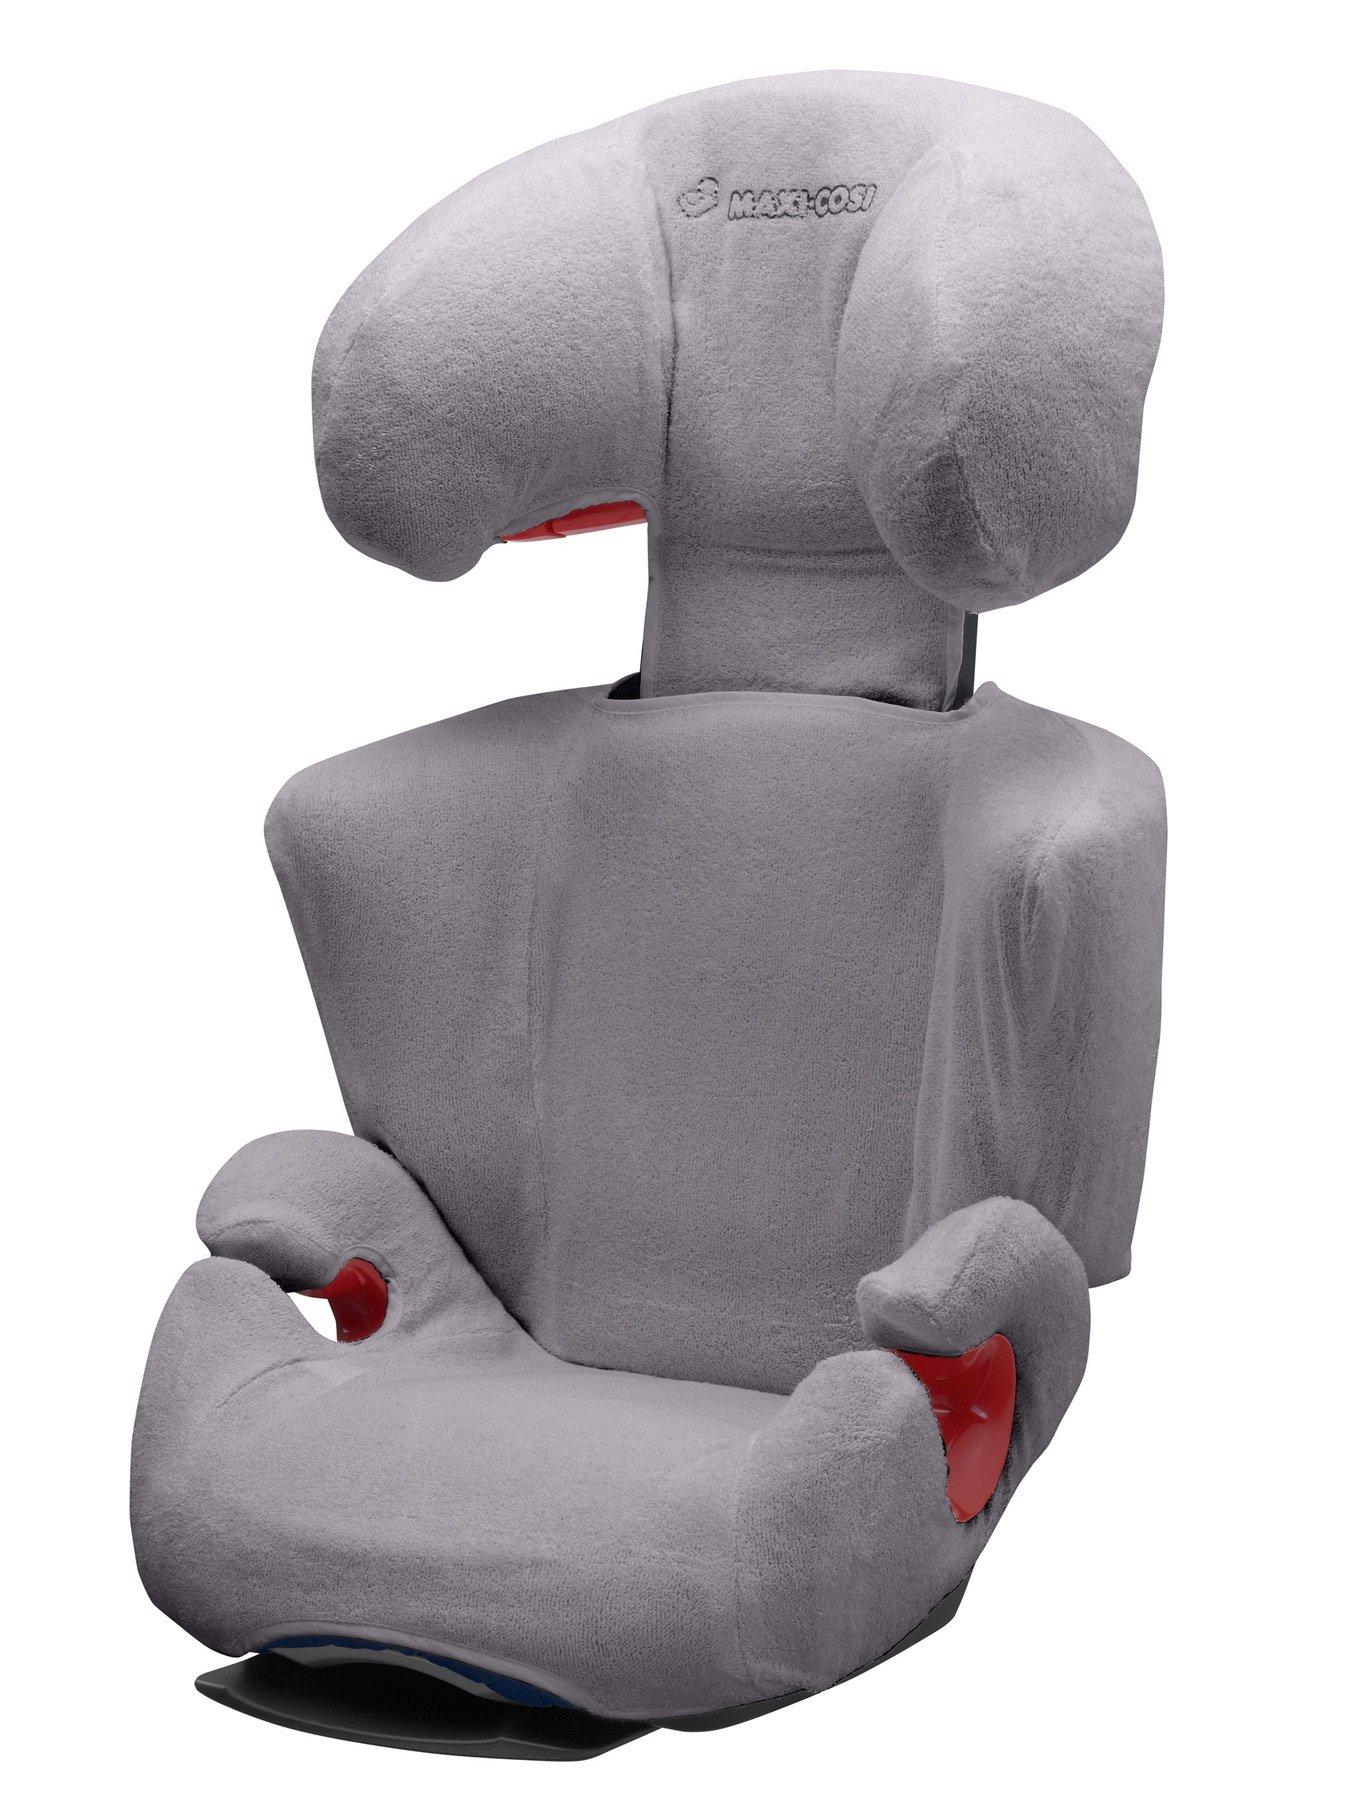 Incredible Maxi Cosi 64708090 Rodi Airprotect Rodi Xp Car Seat Summer Cjindustries Chair Design For Home Cjindustriesco